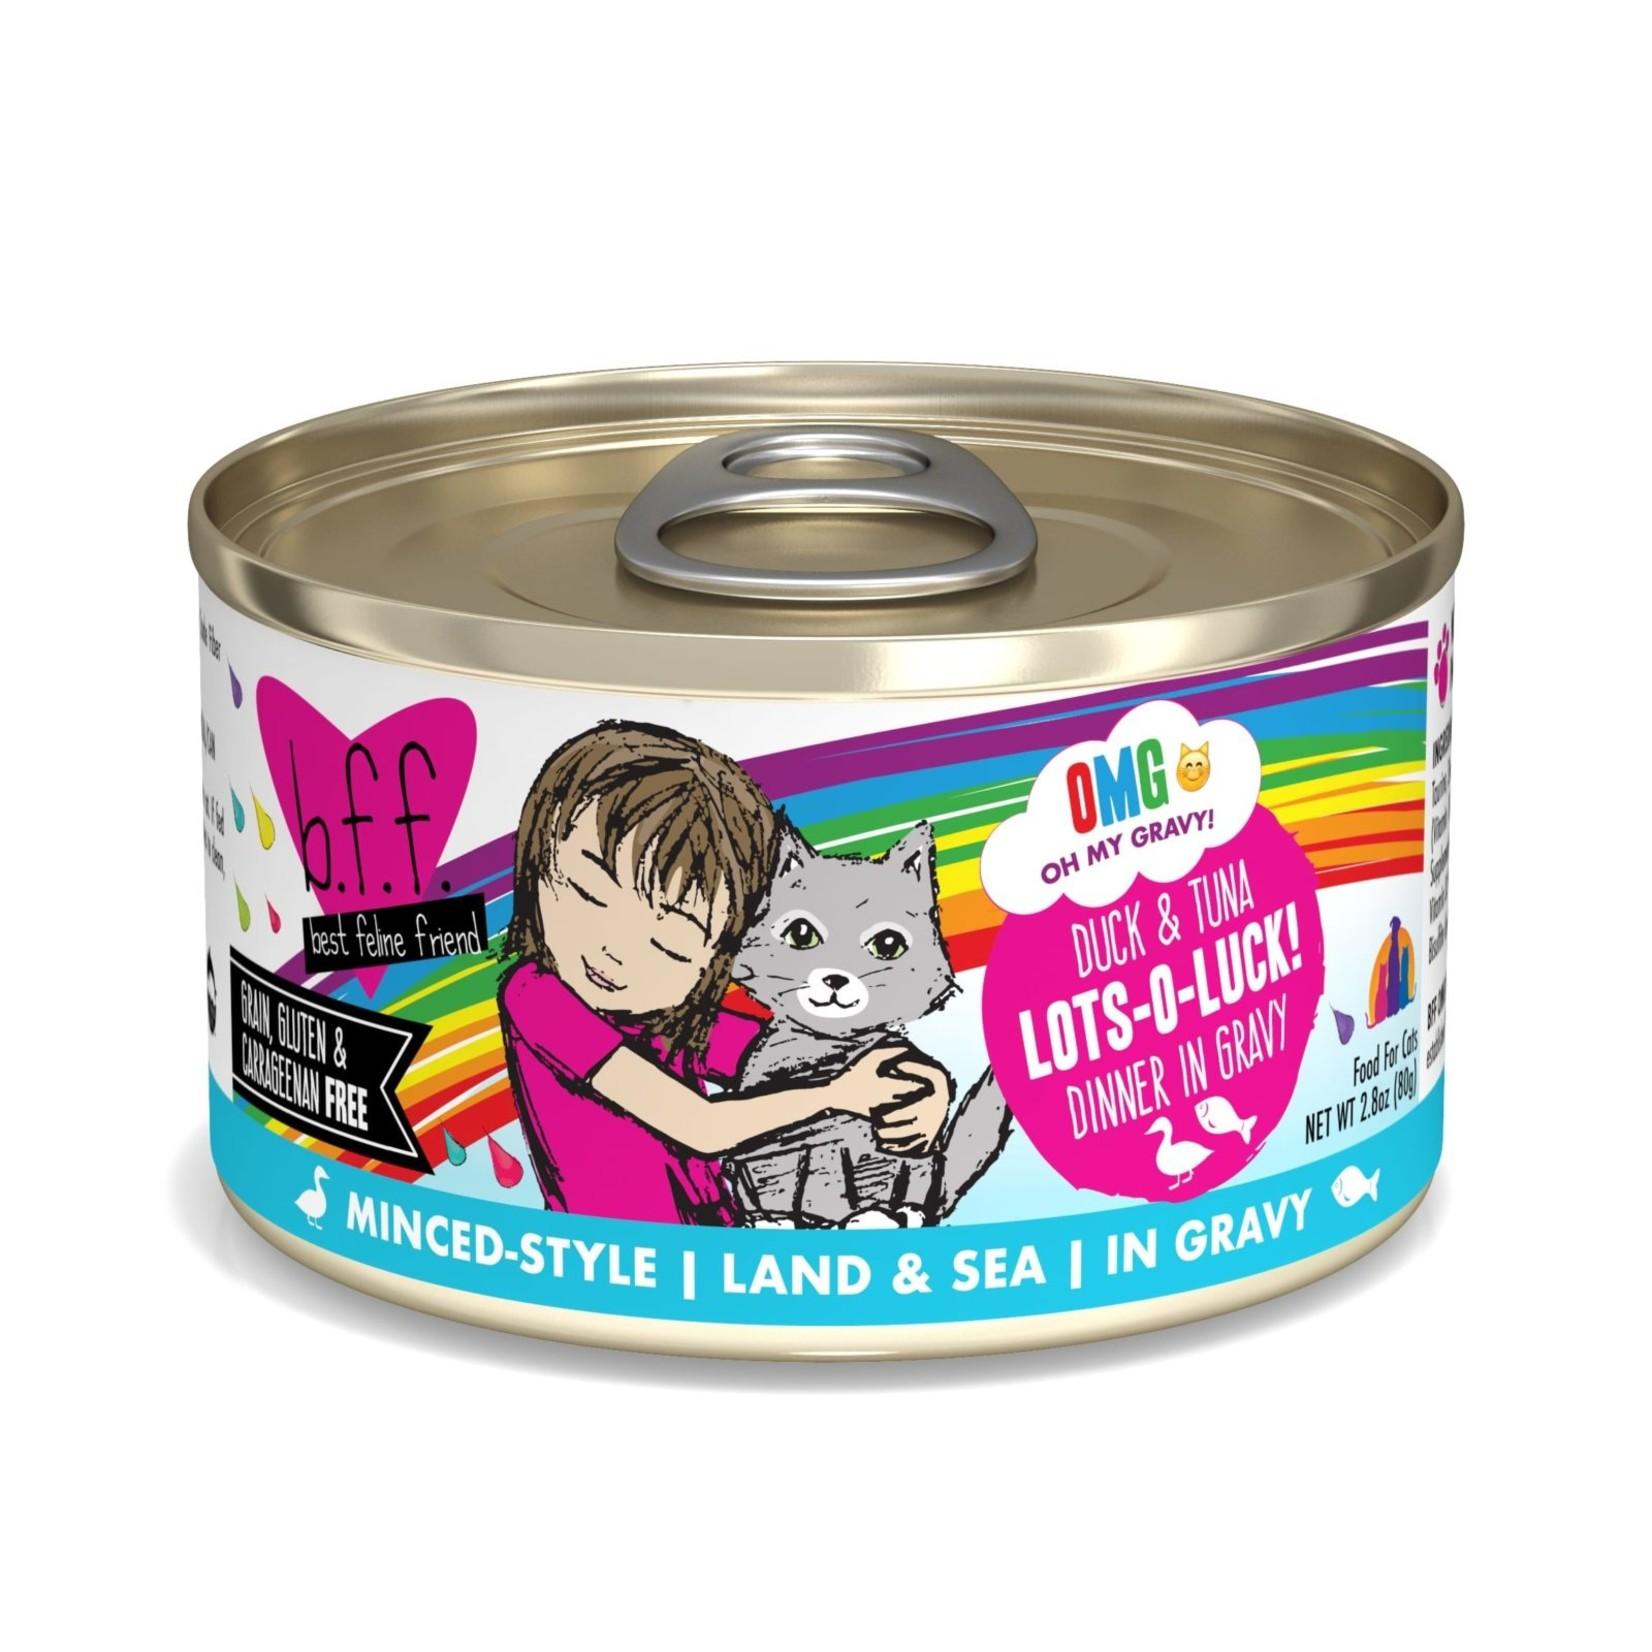 Weruva Weruva BFF OMG Duck & Tuna Lots-O-Luck! Cat Can 2.8oz